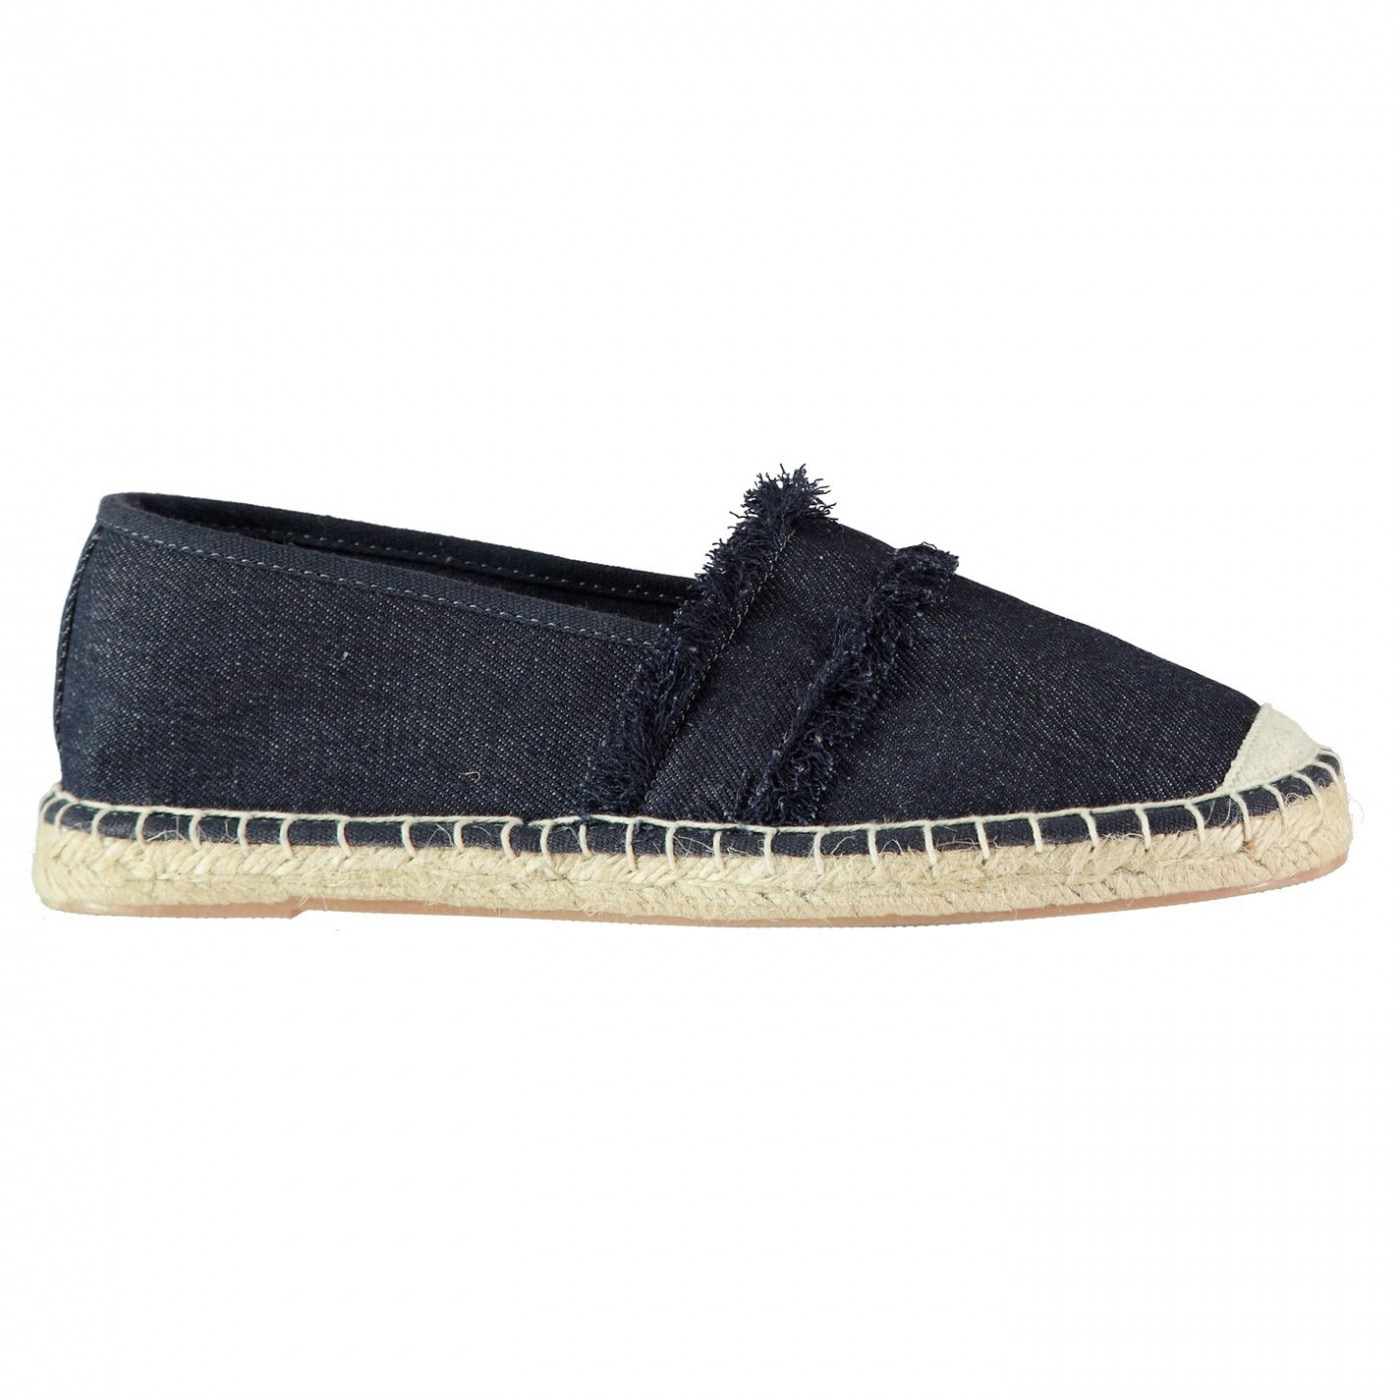 Miso Ezme Espadrille Ladies Shoes